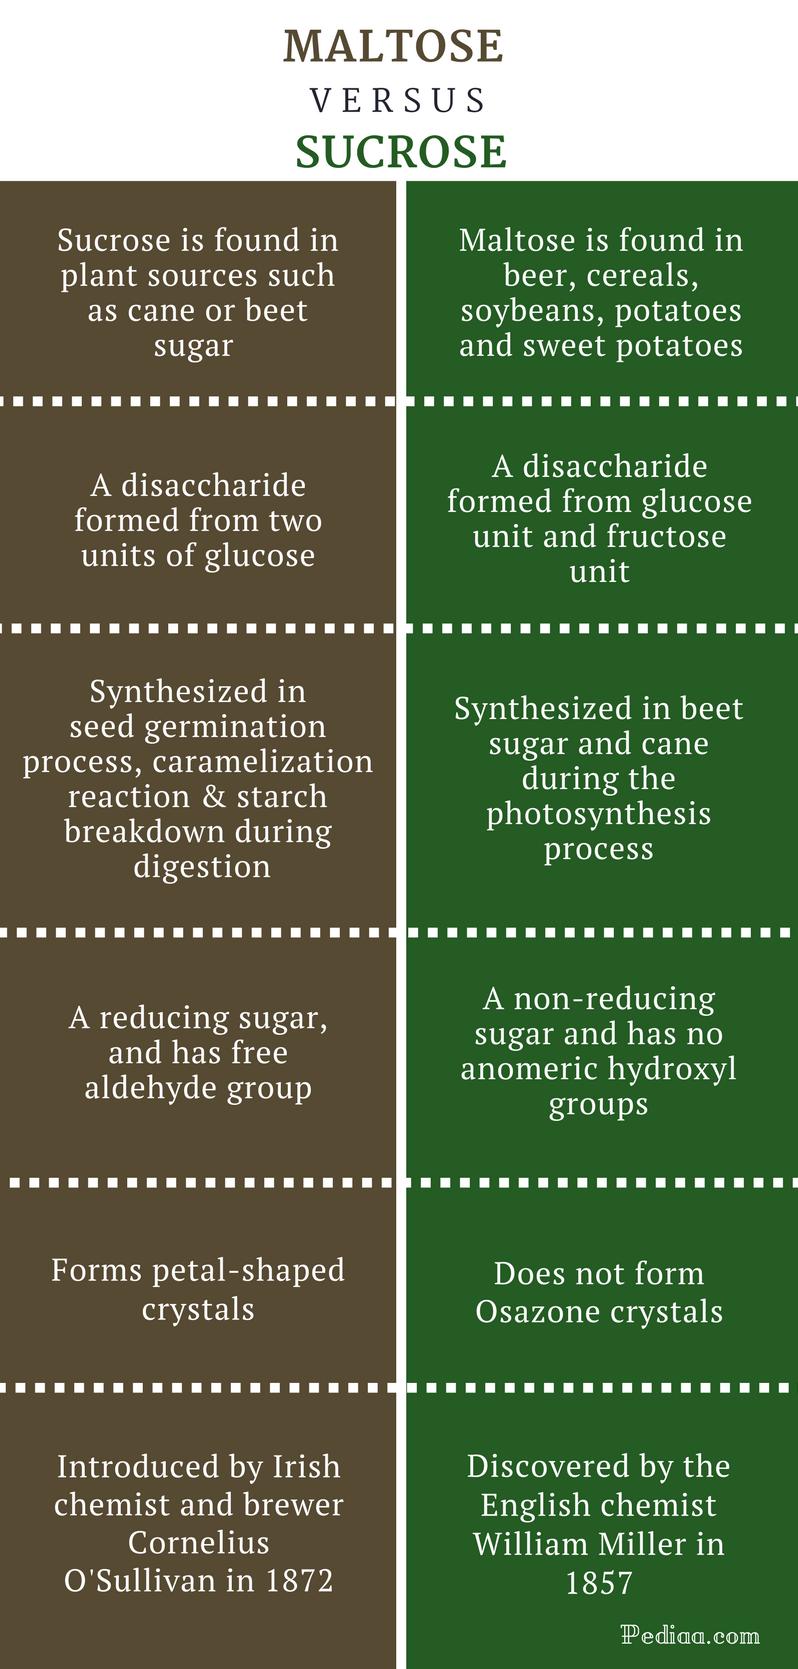 Difference Between Maltose and Sucrose - Maltose vs Sucrose Comparison Summary